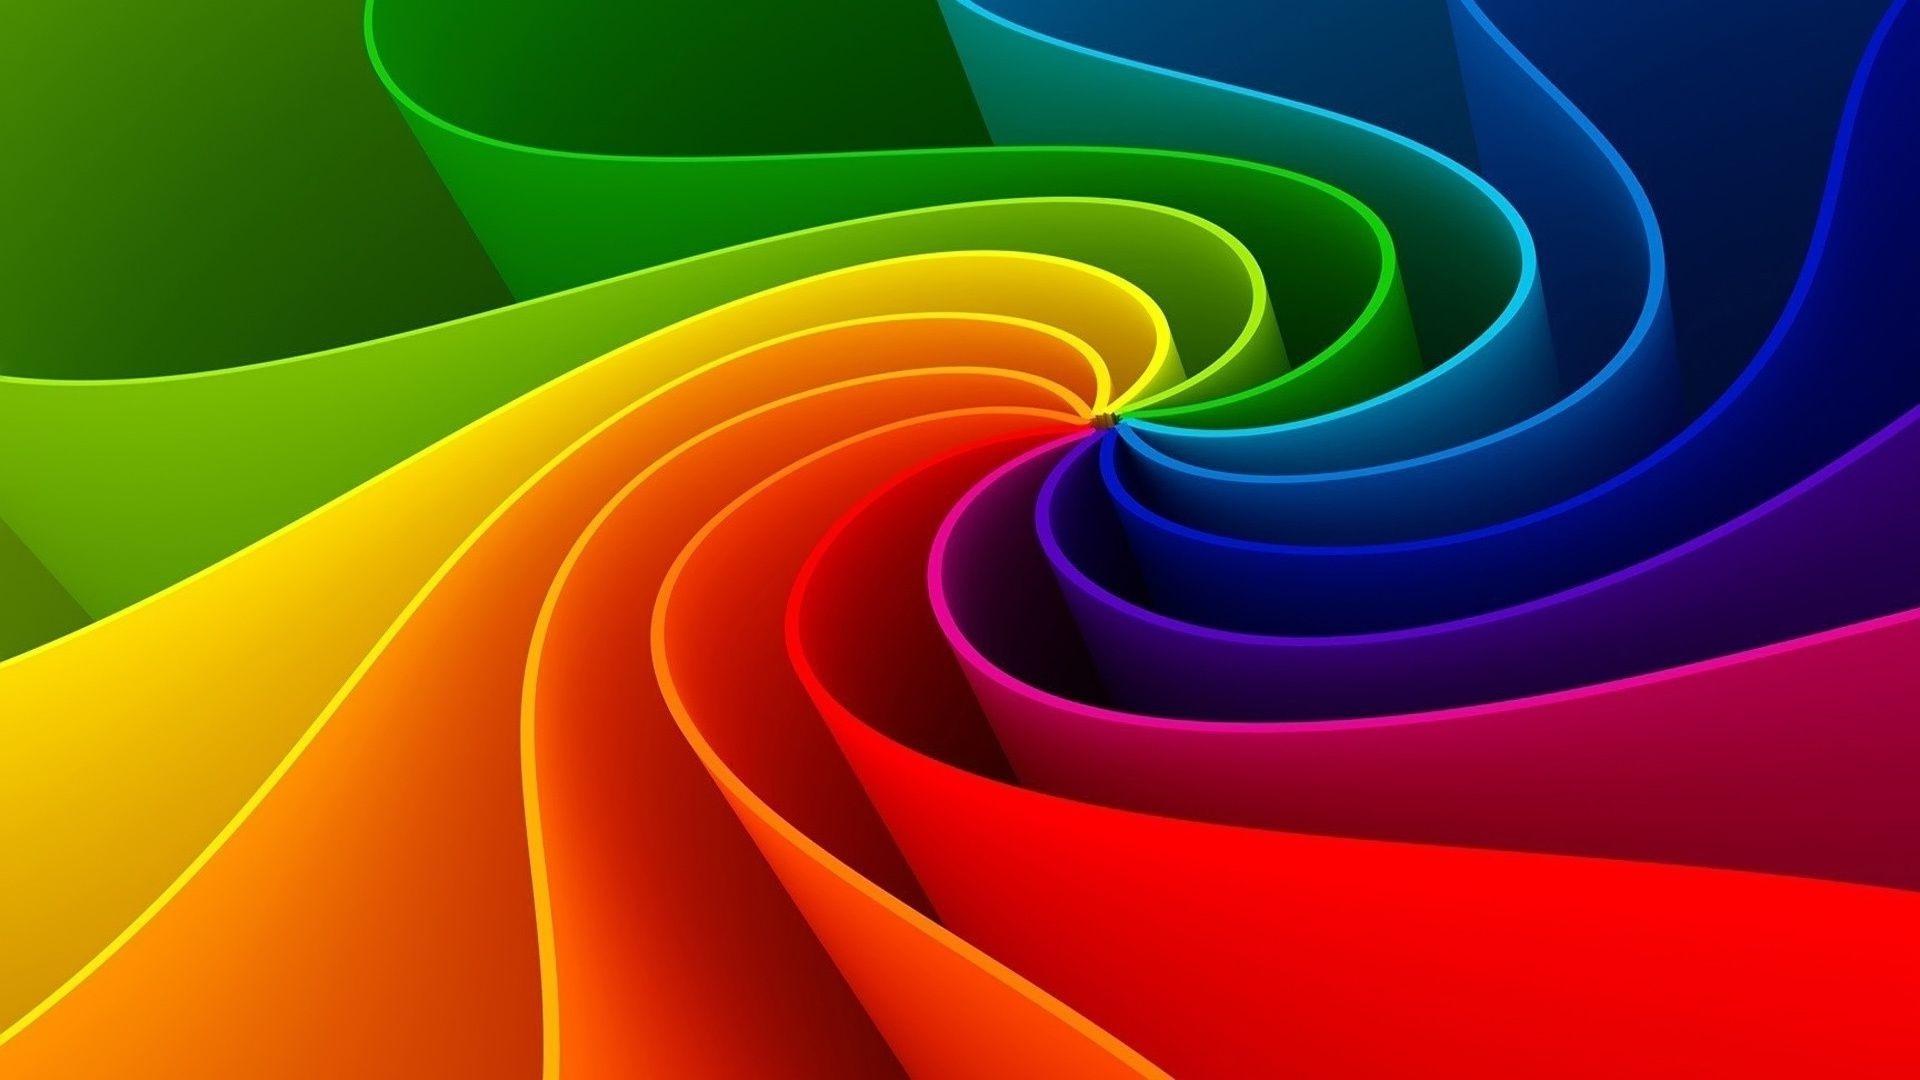 techno rainbow background - photo #40